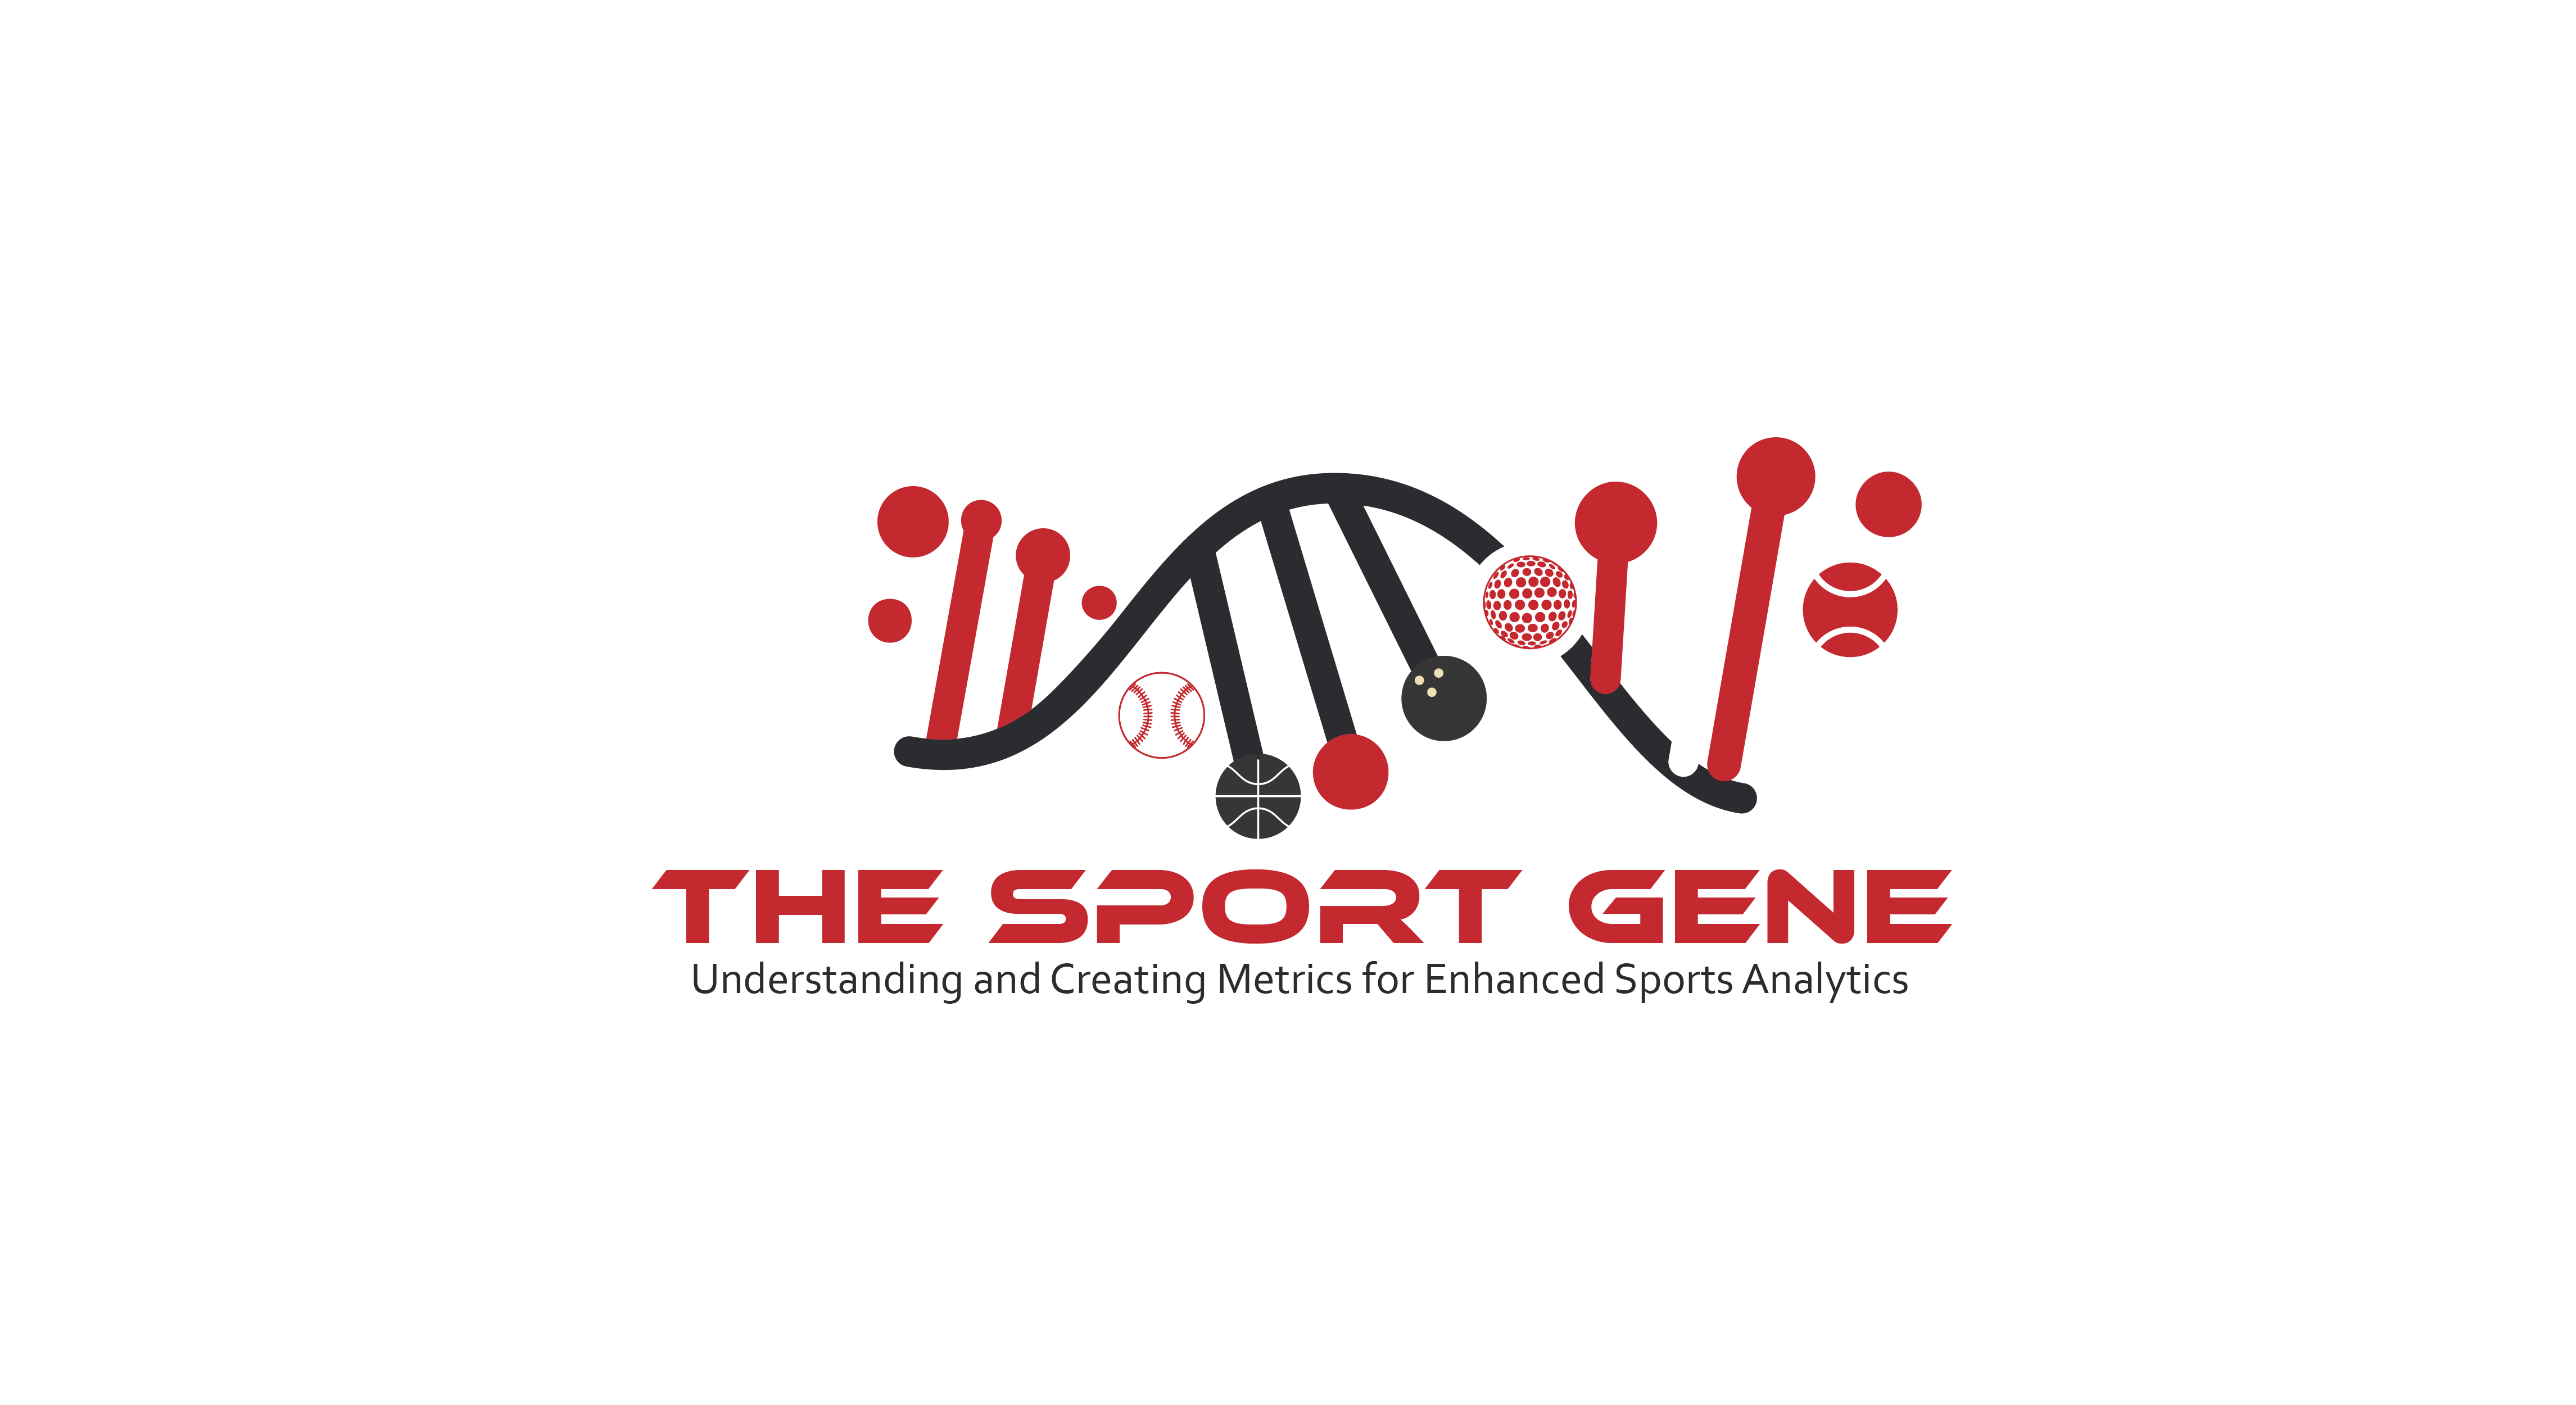 The Sport Gene